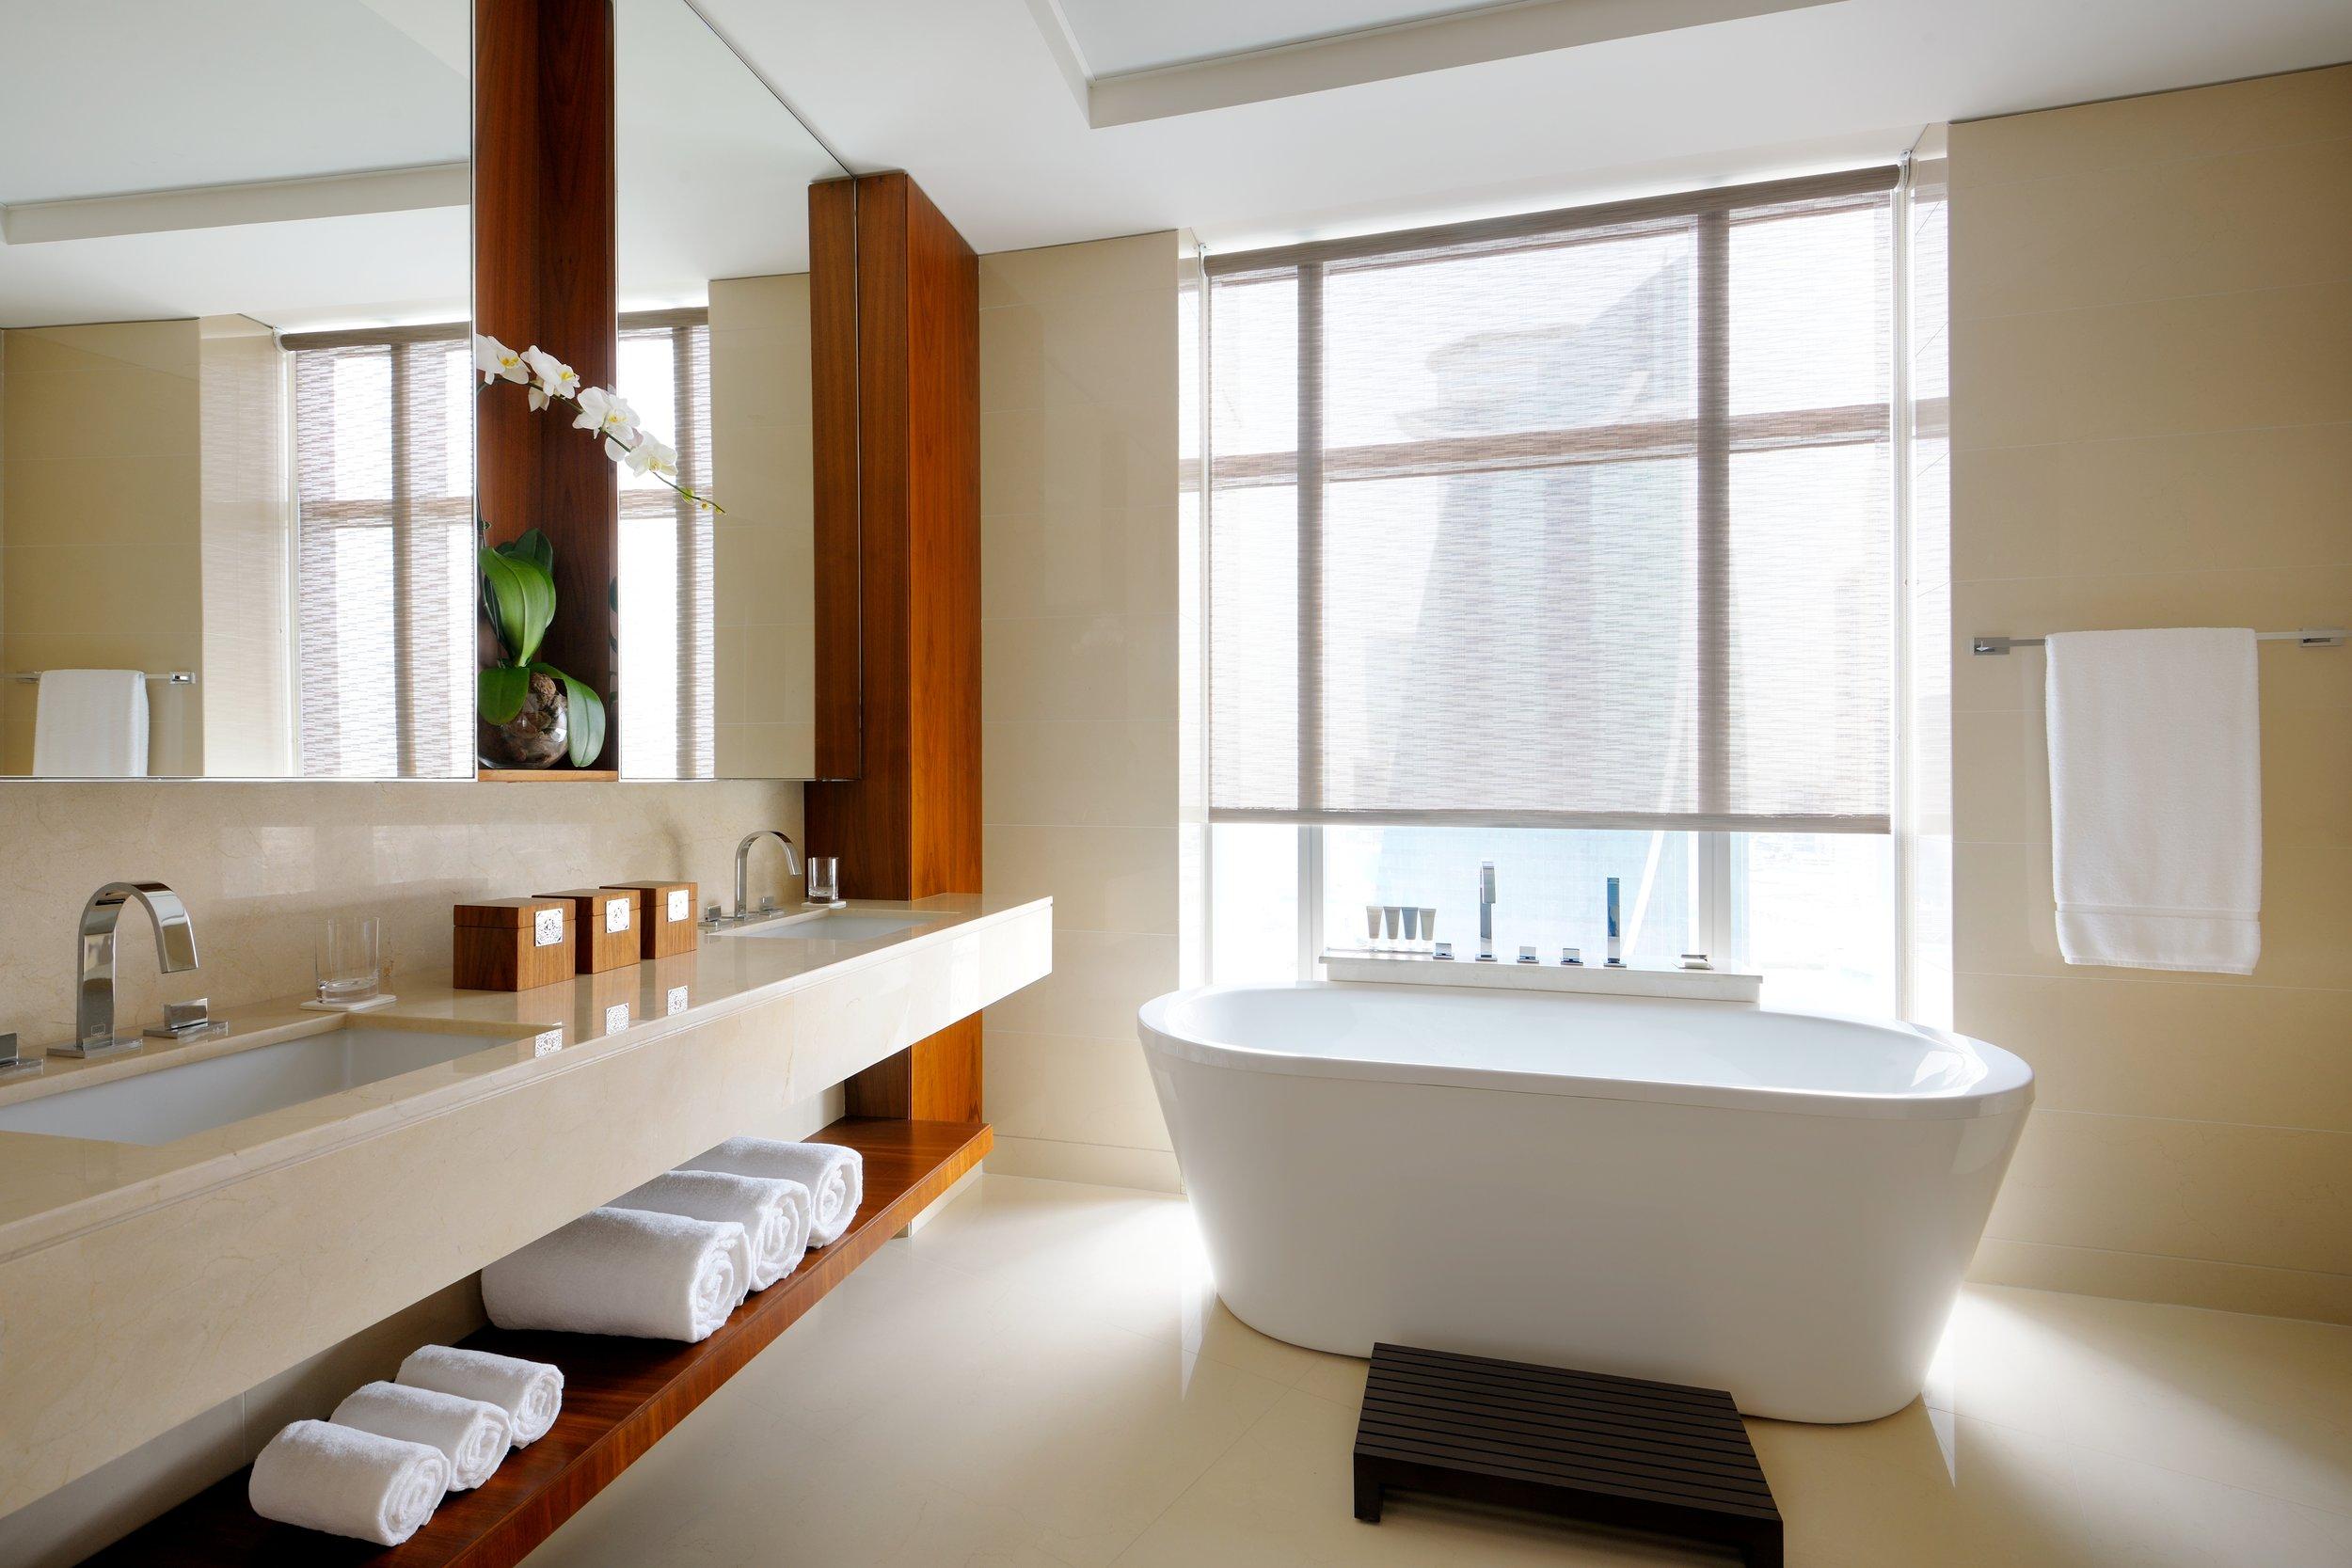 JWMM_ExecutiveSuite_Bathroom.JPG